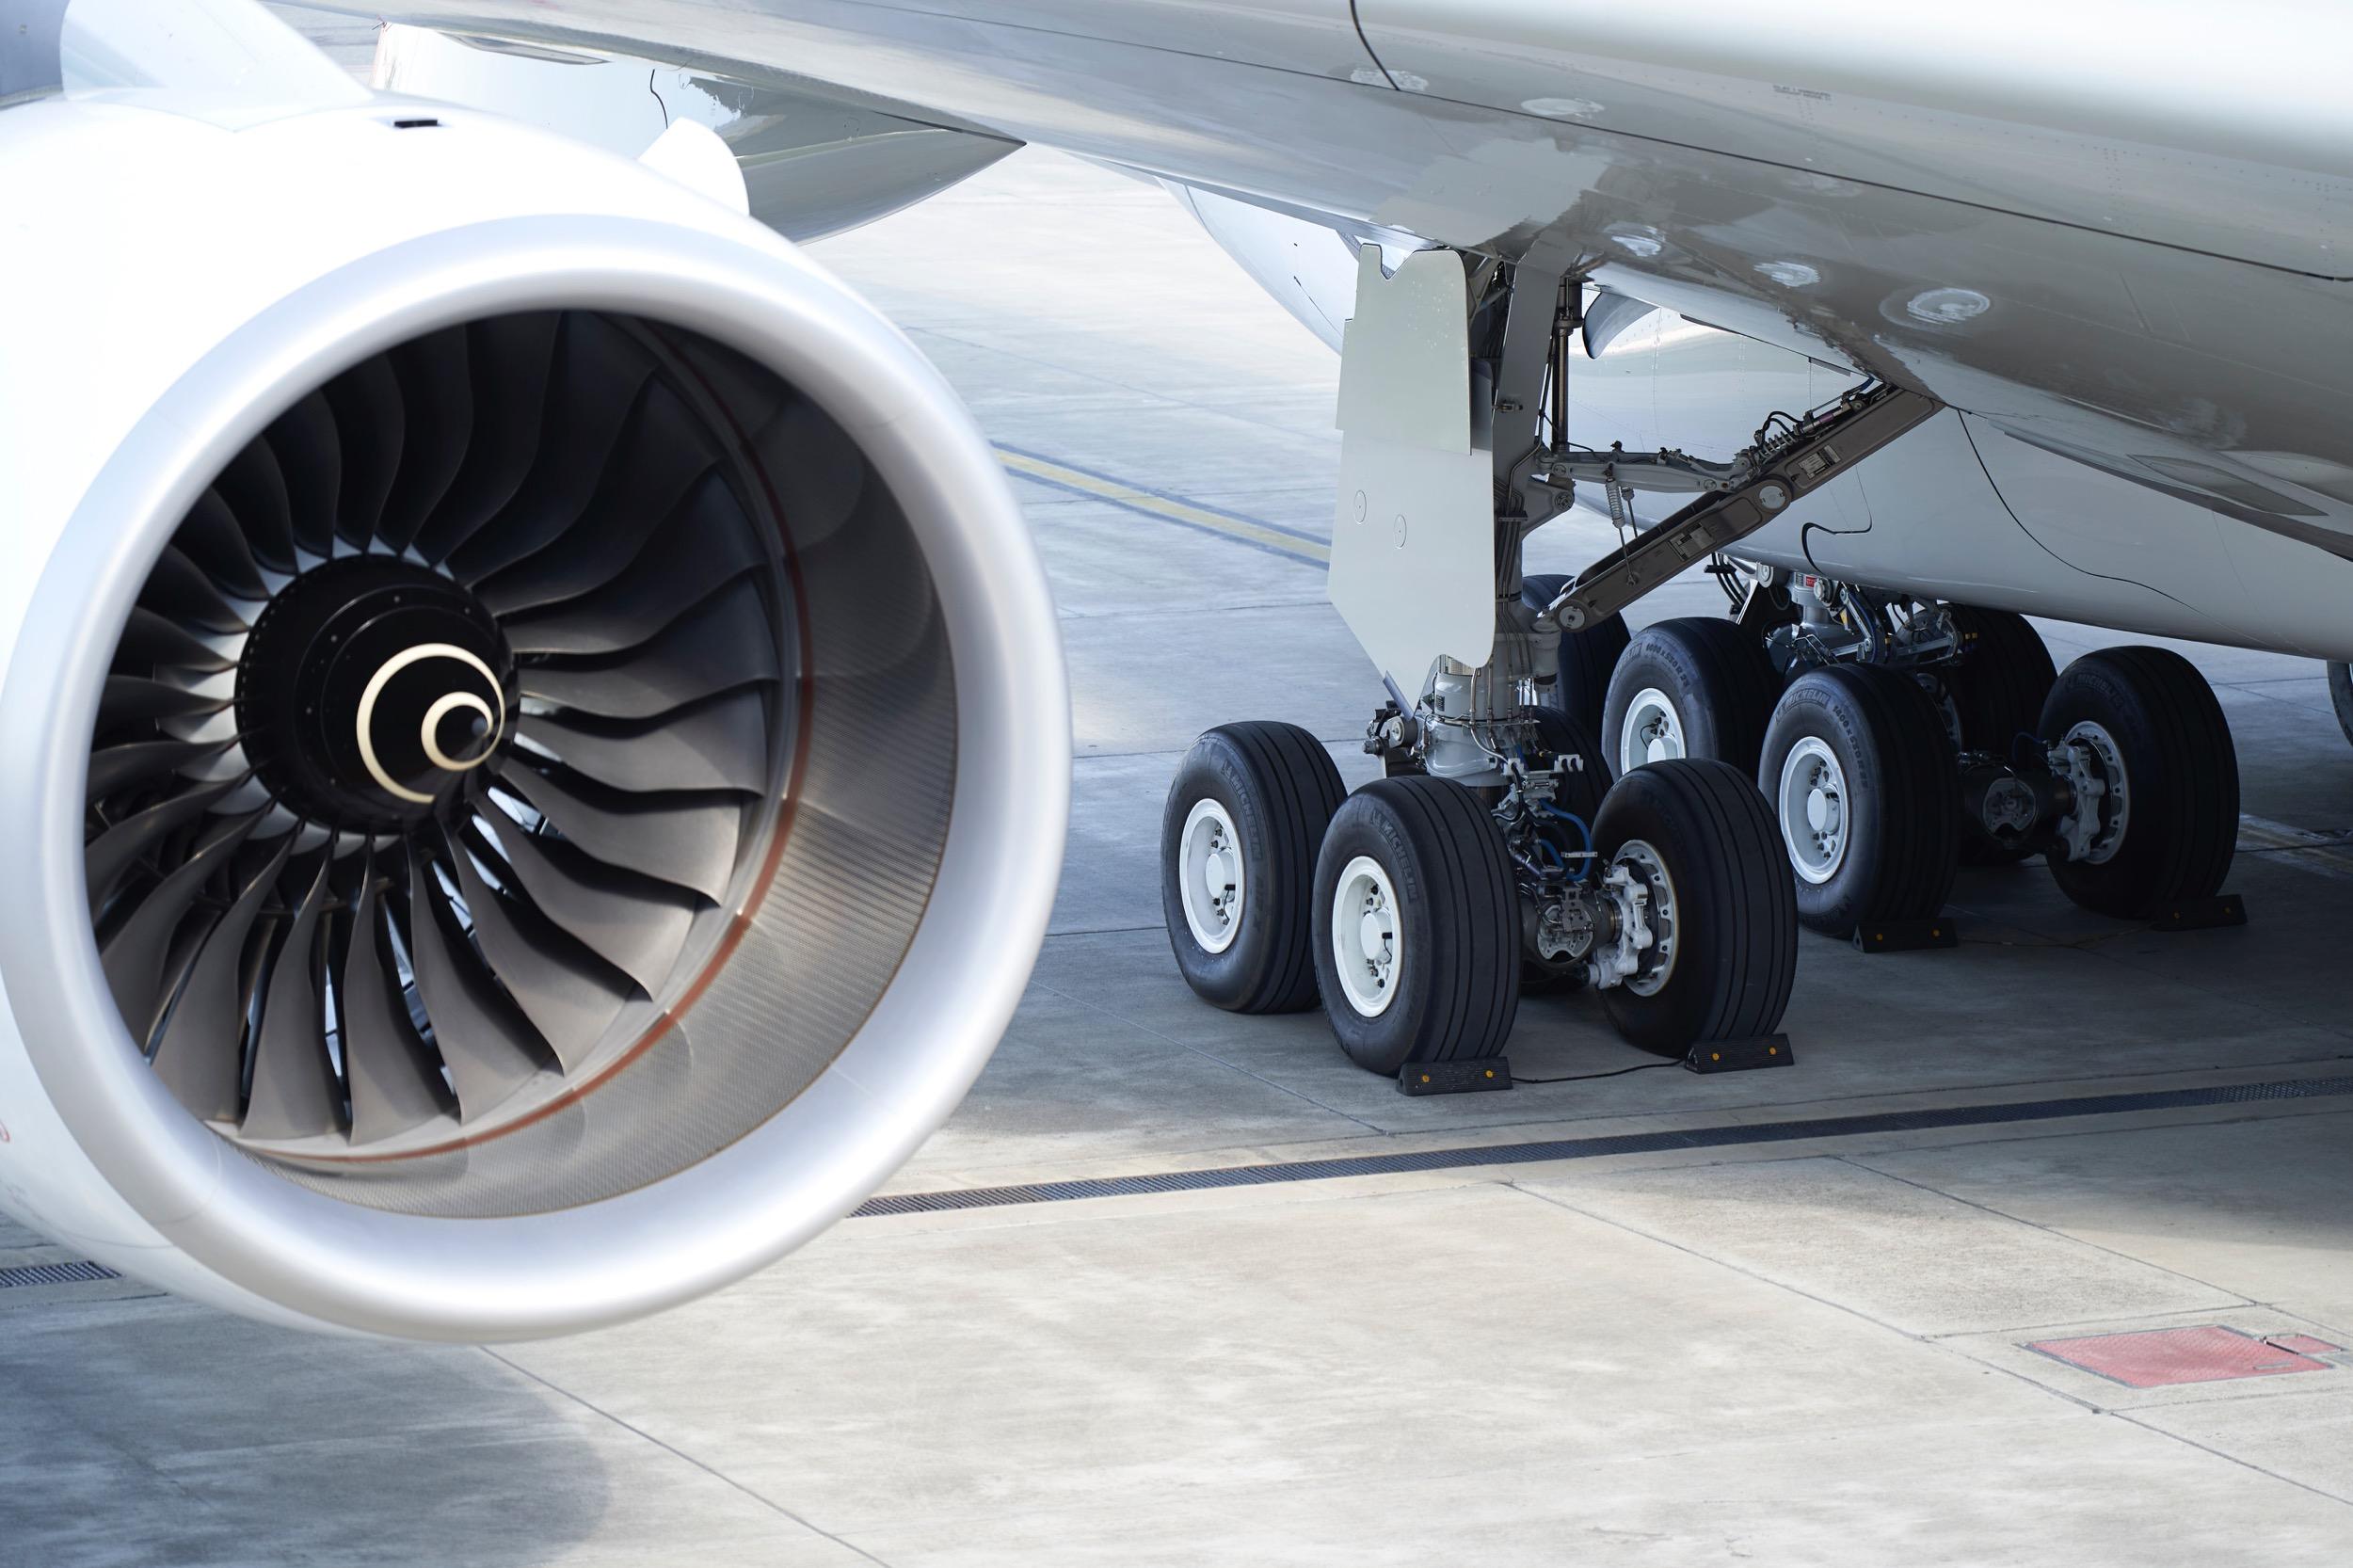 rolls-royce-jet-engine-airbus-a380.jpg